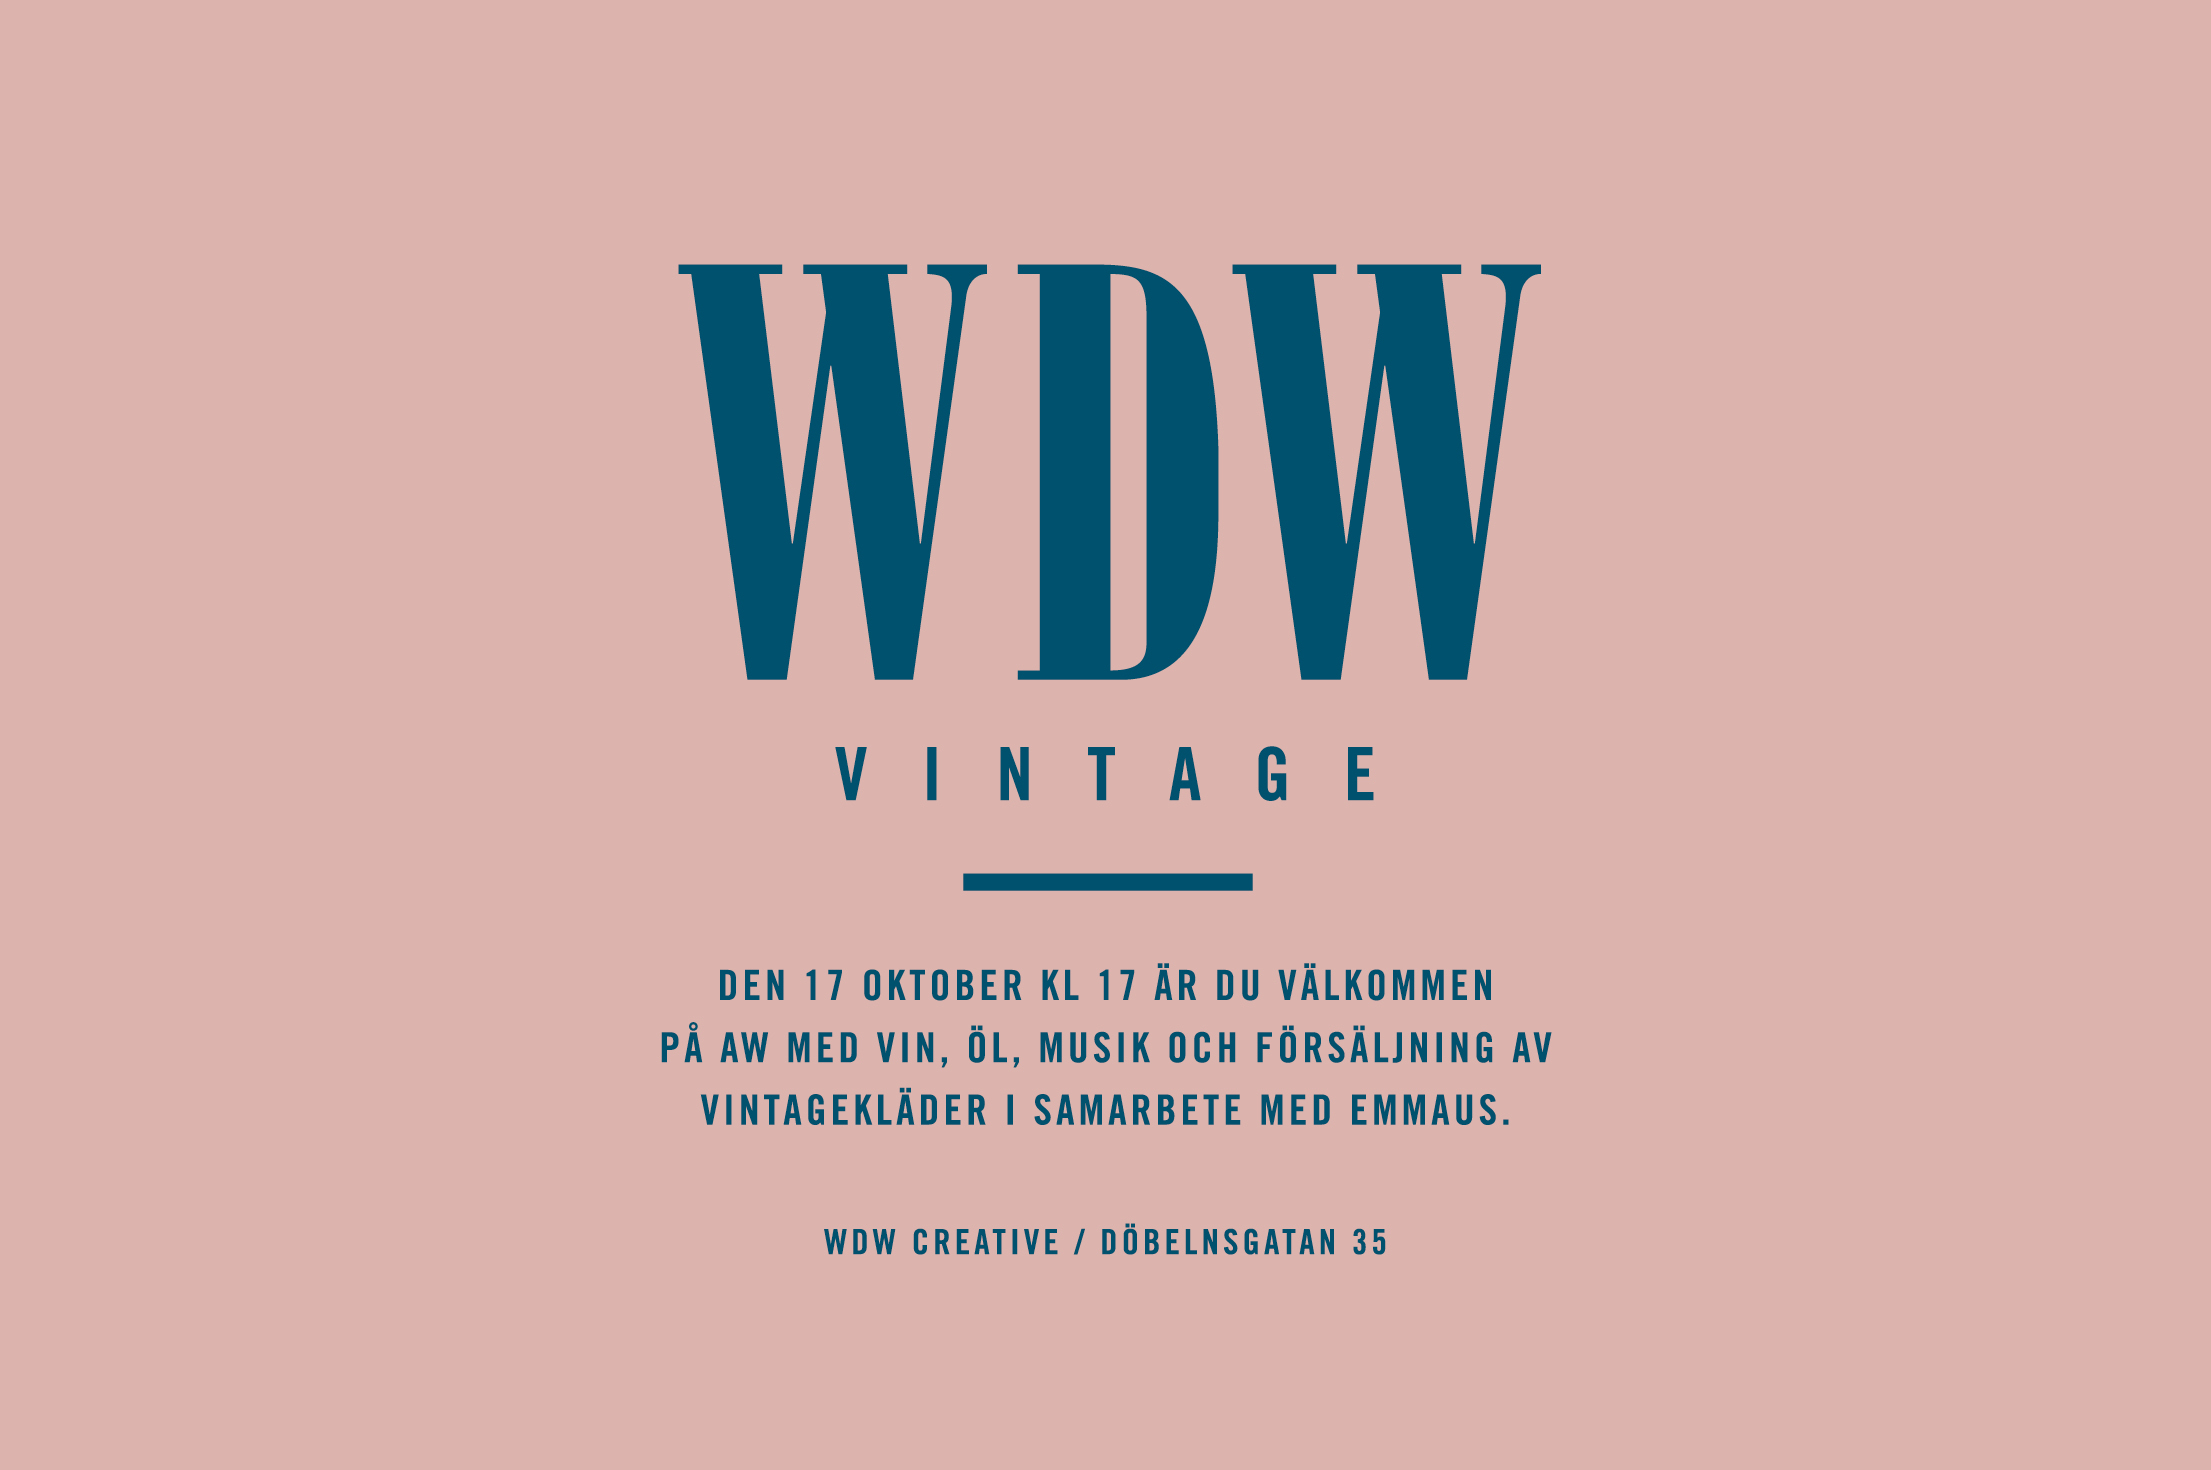 Inbjudan_Hemsidan_WDW_Vintage.jpg